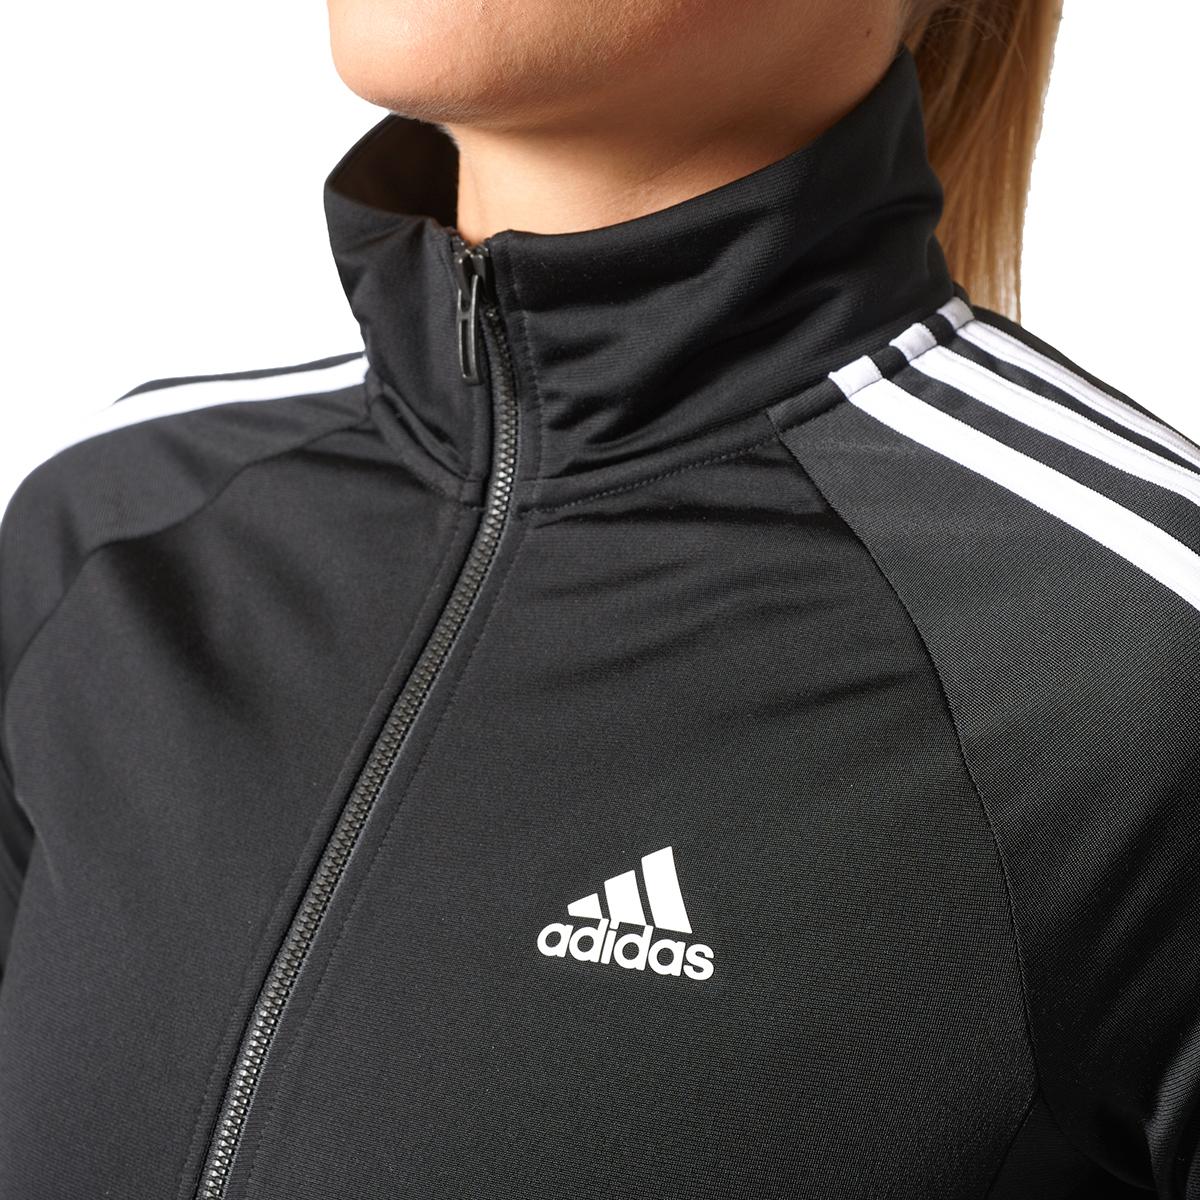 adidas Womens Designed-2-Move Track Jacket